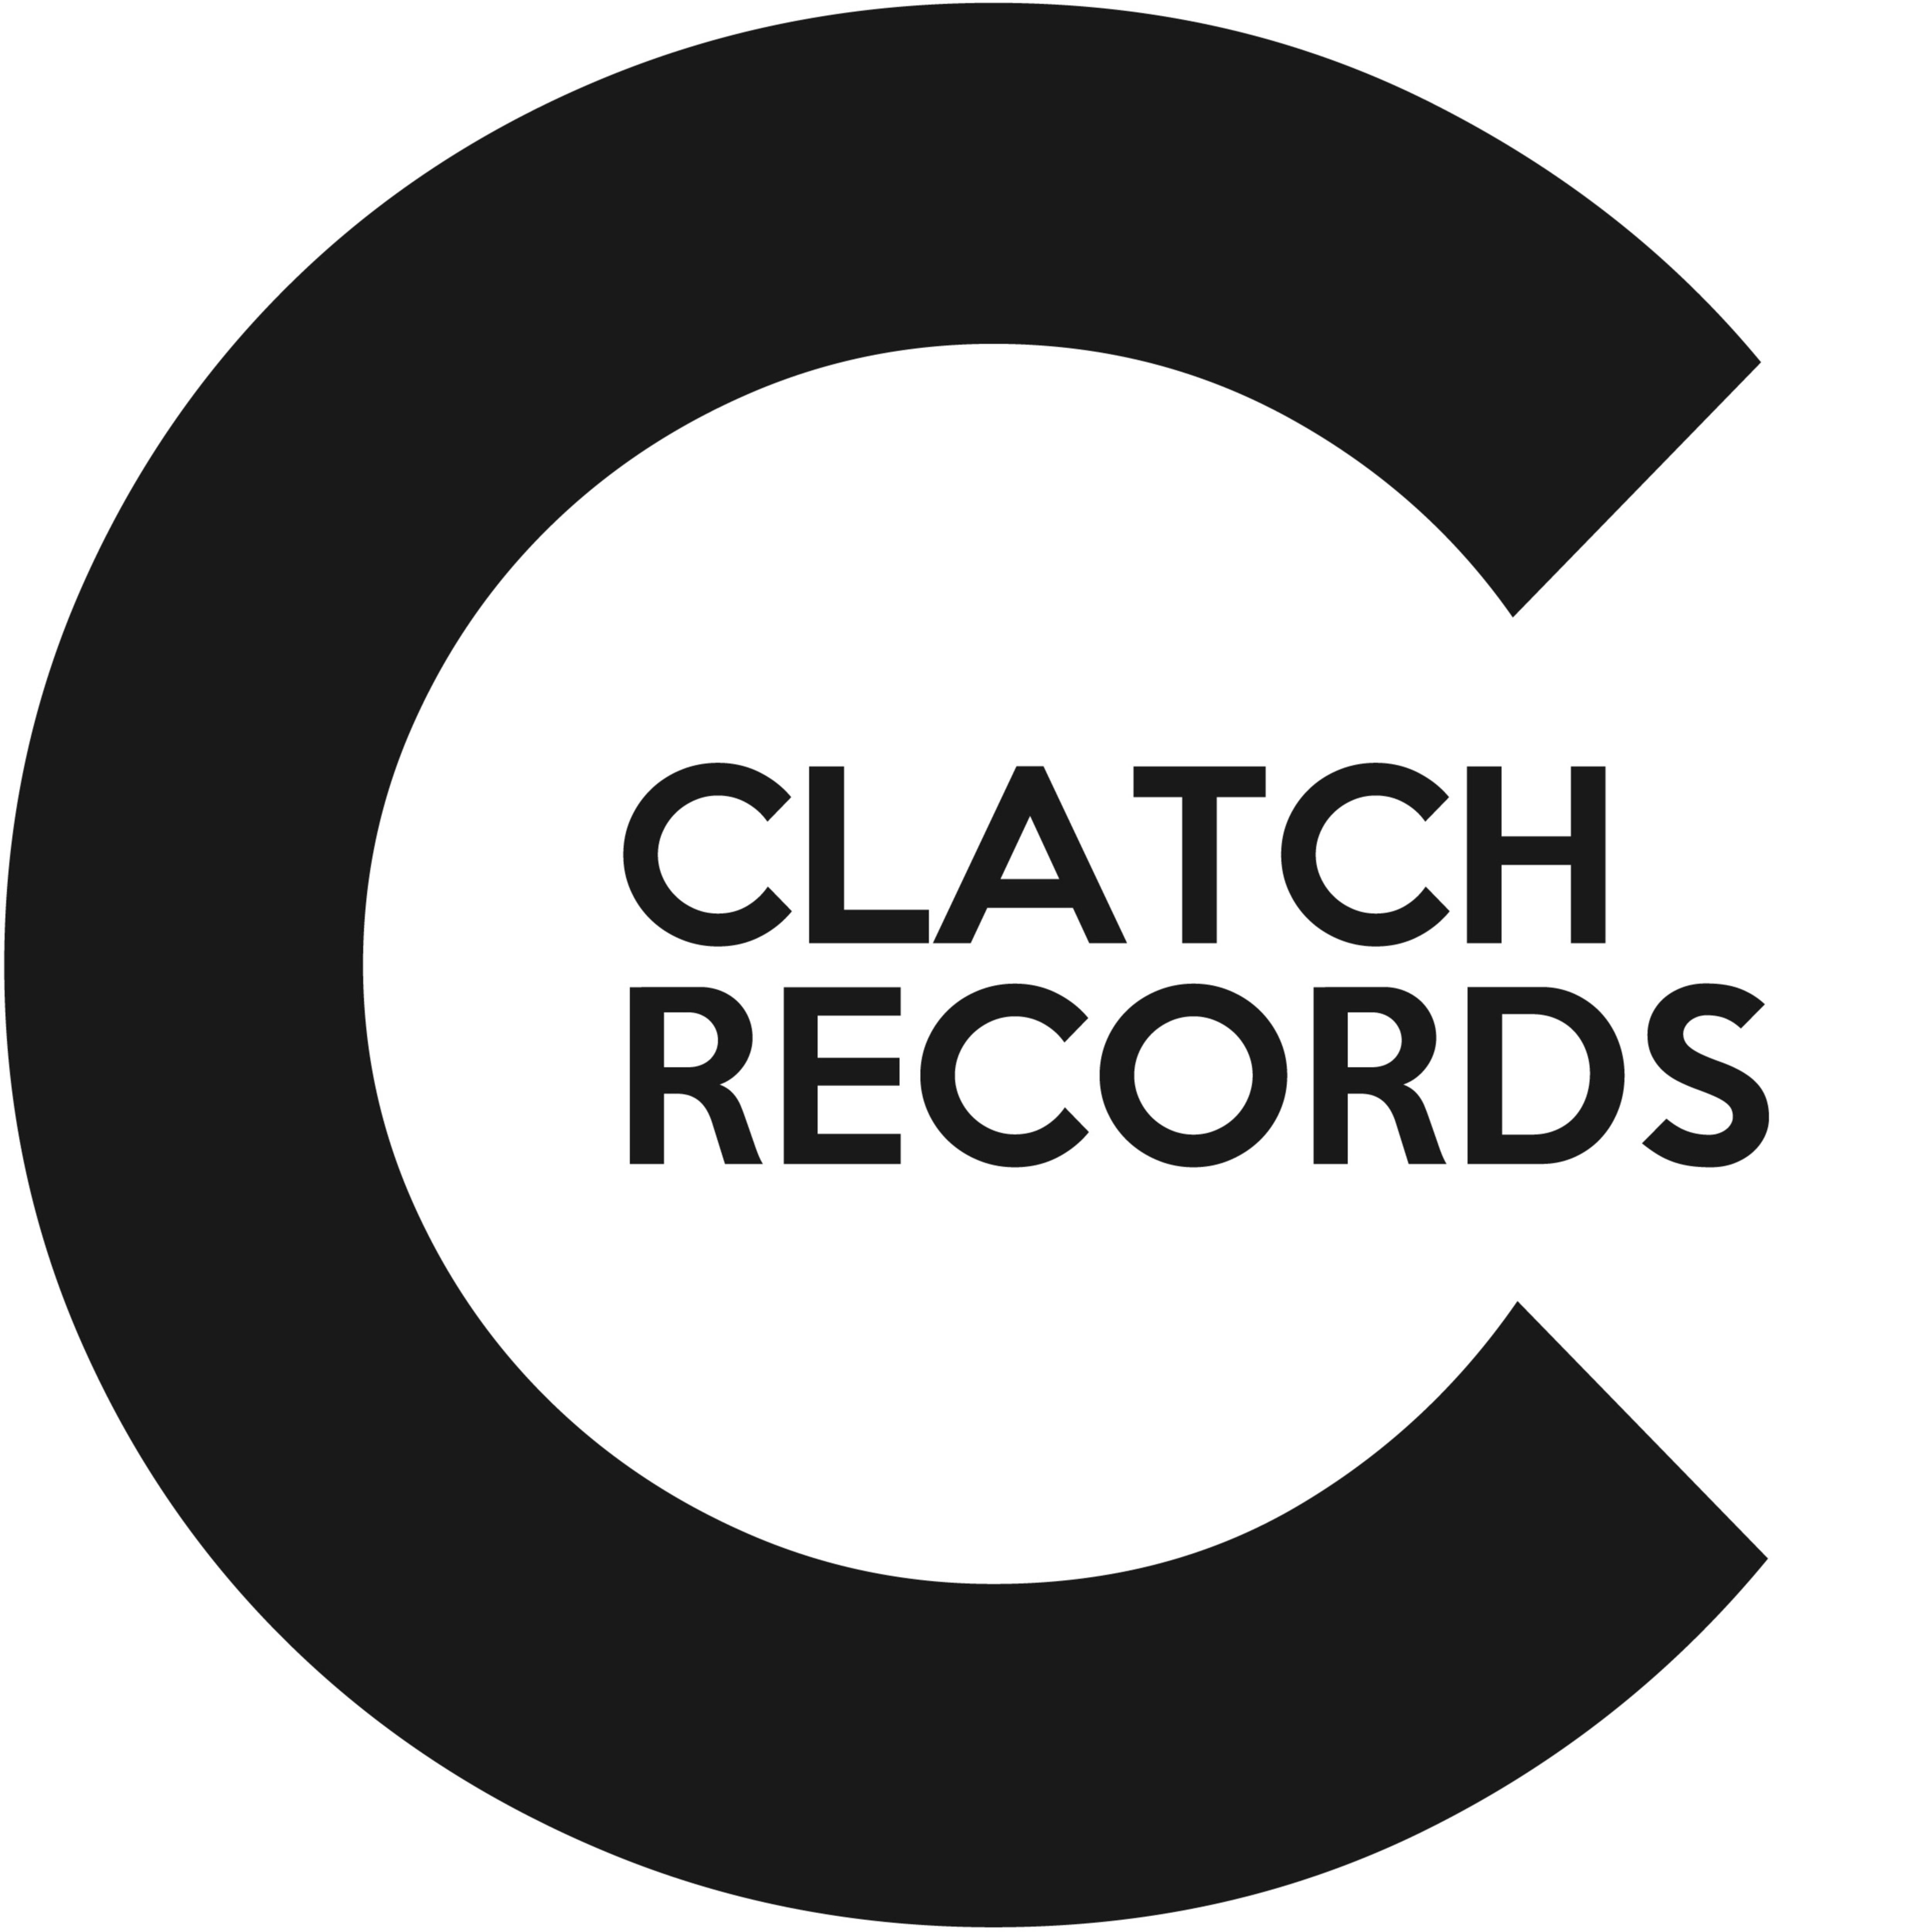 Clatch Records